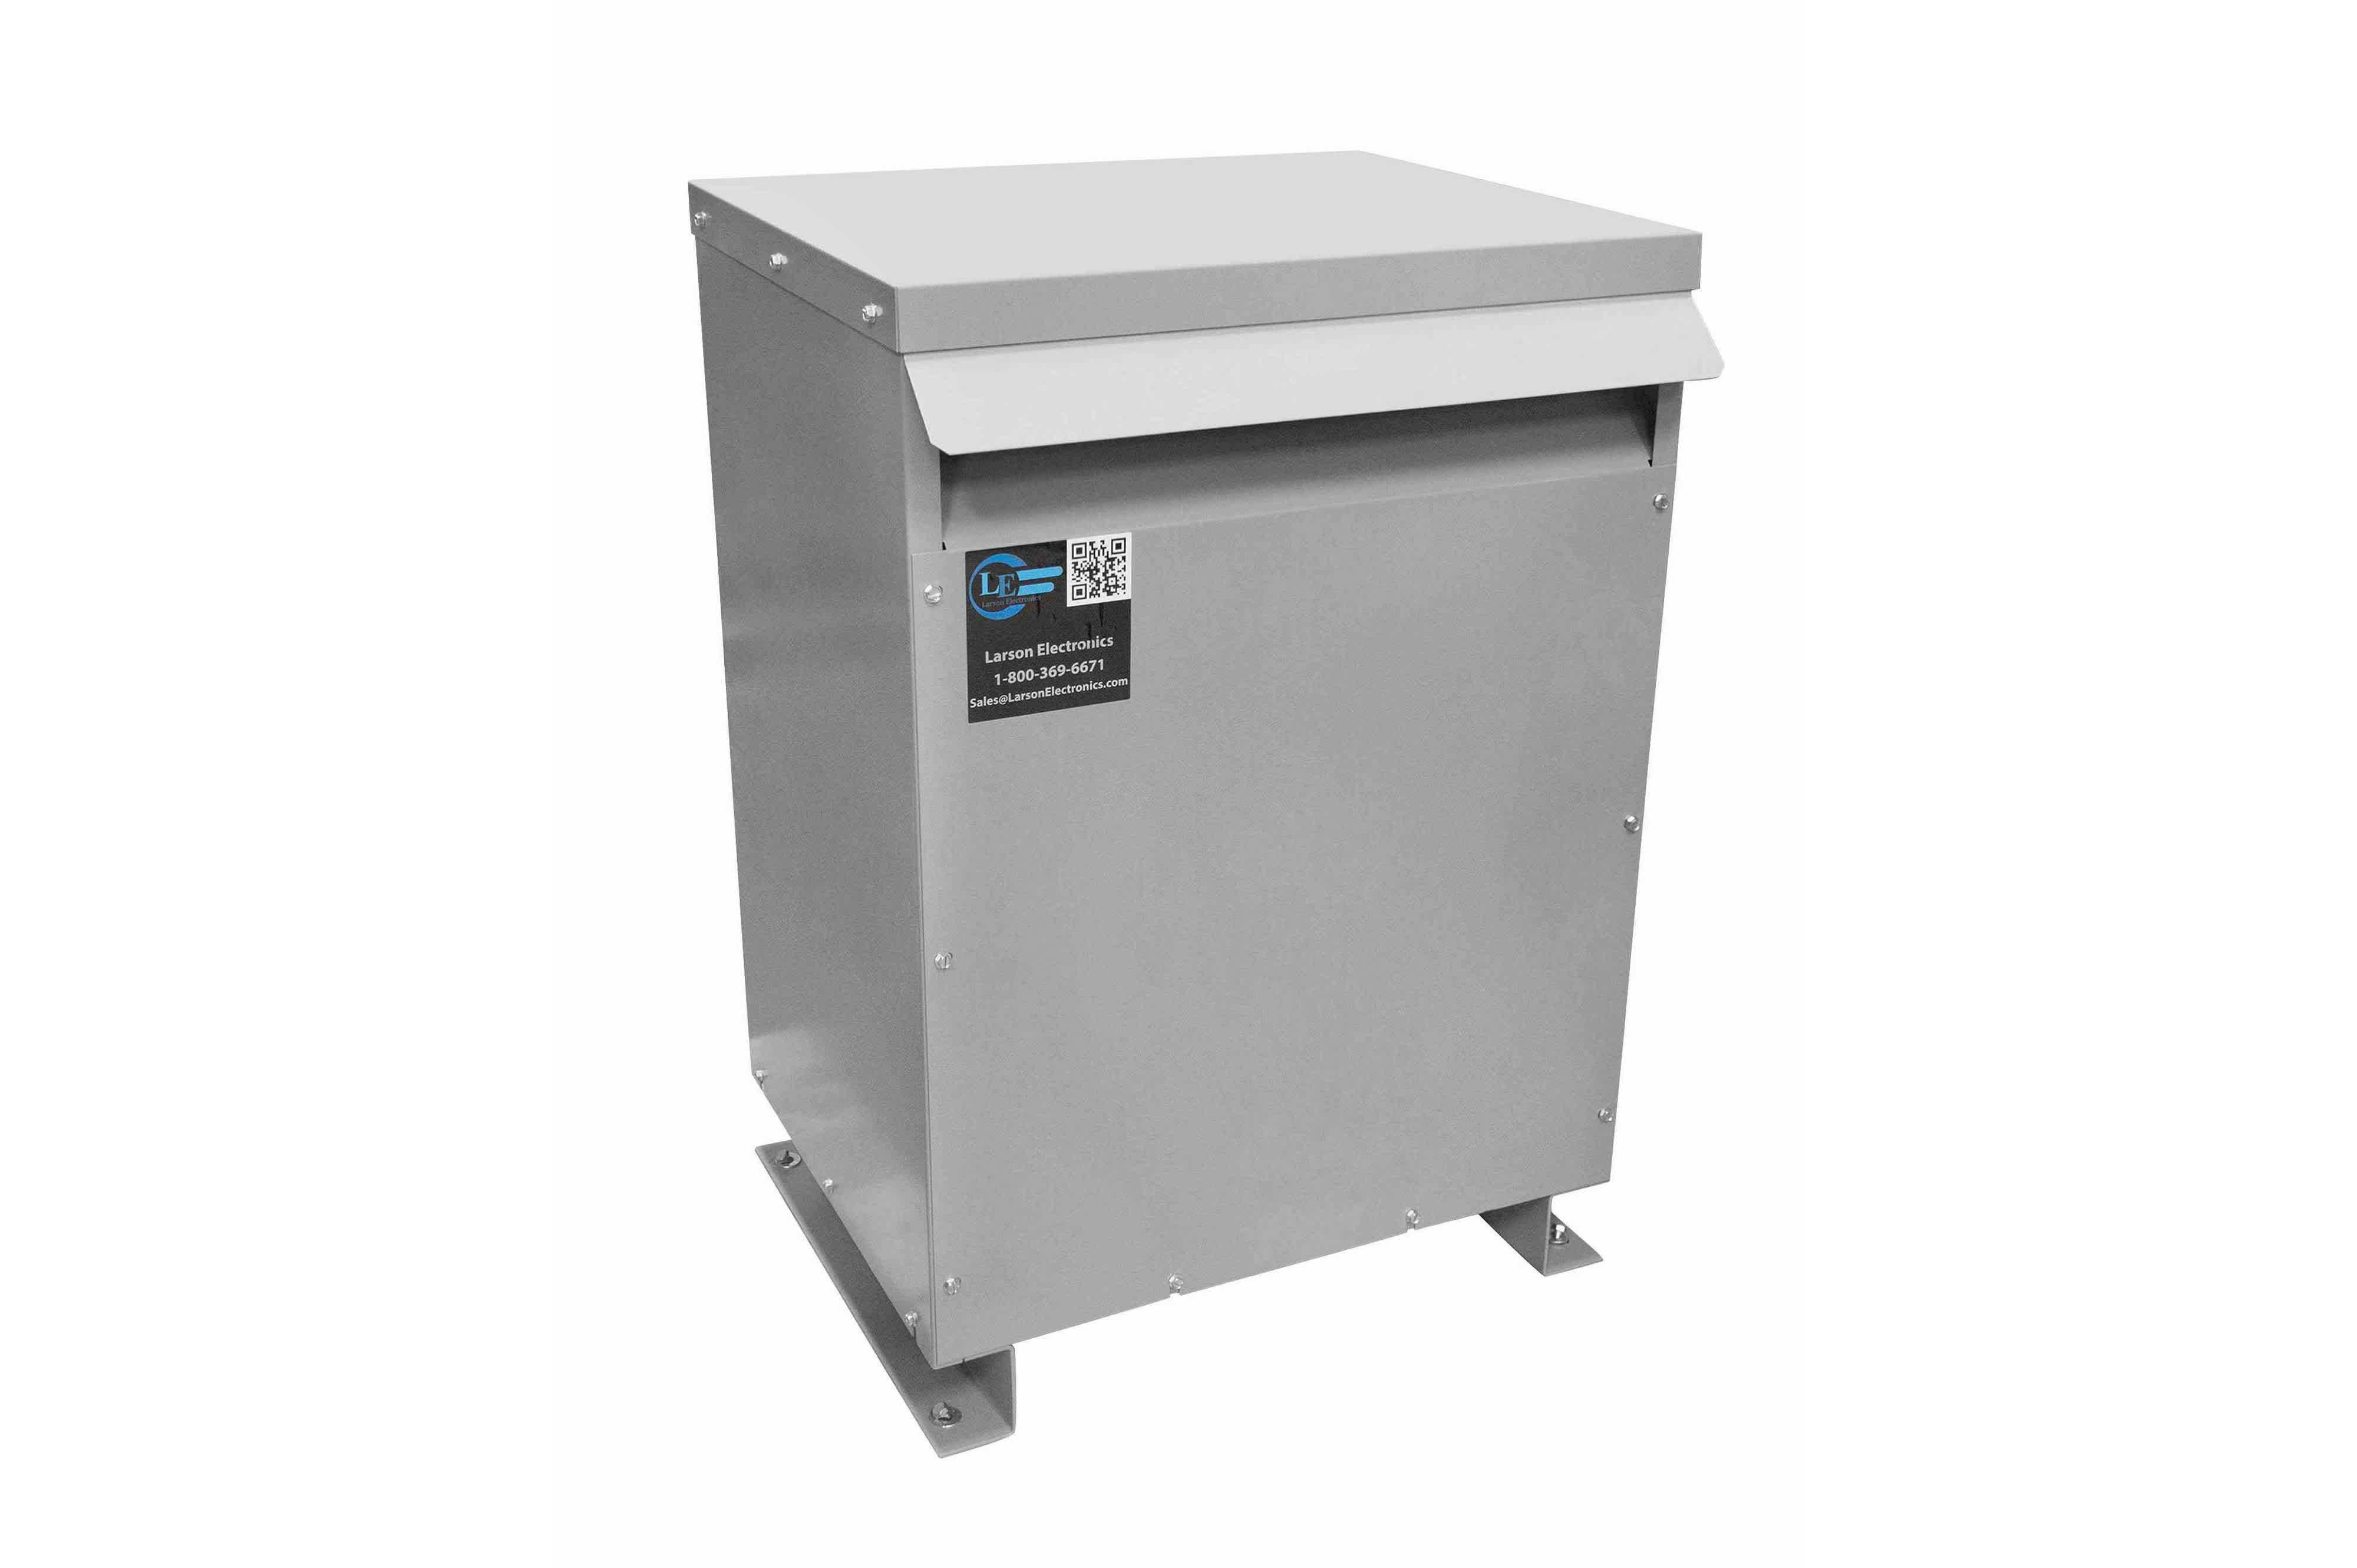 42.5 kVA 3PH Isolation Transformer, 460V Wye Primary, 415V Delta Secondary, N3R, Ventilated, 60 Hz